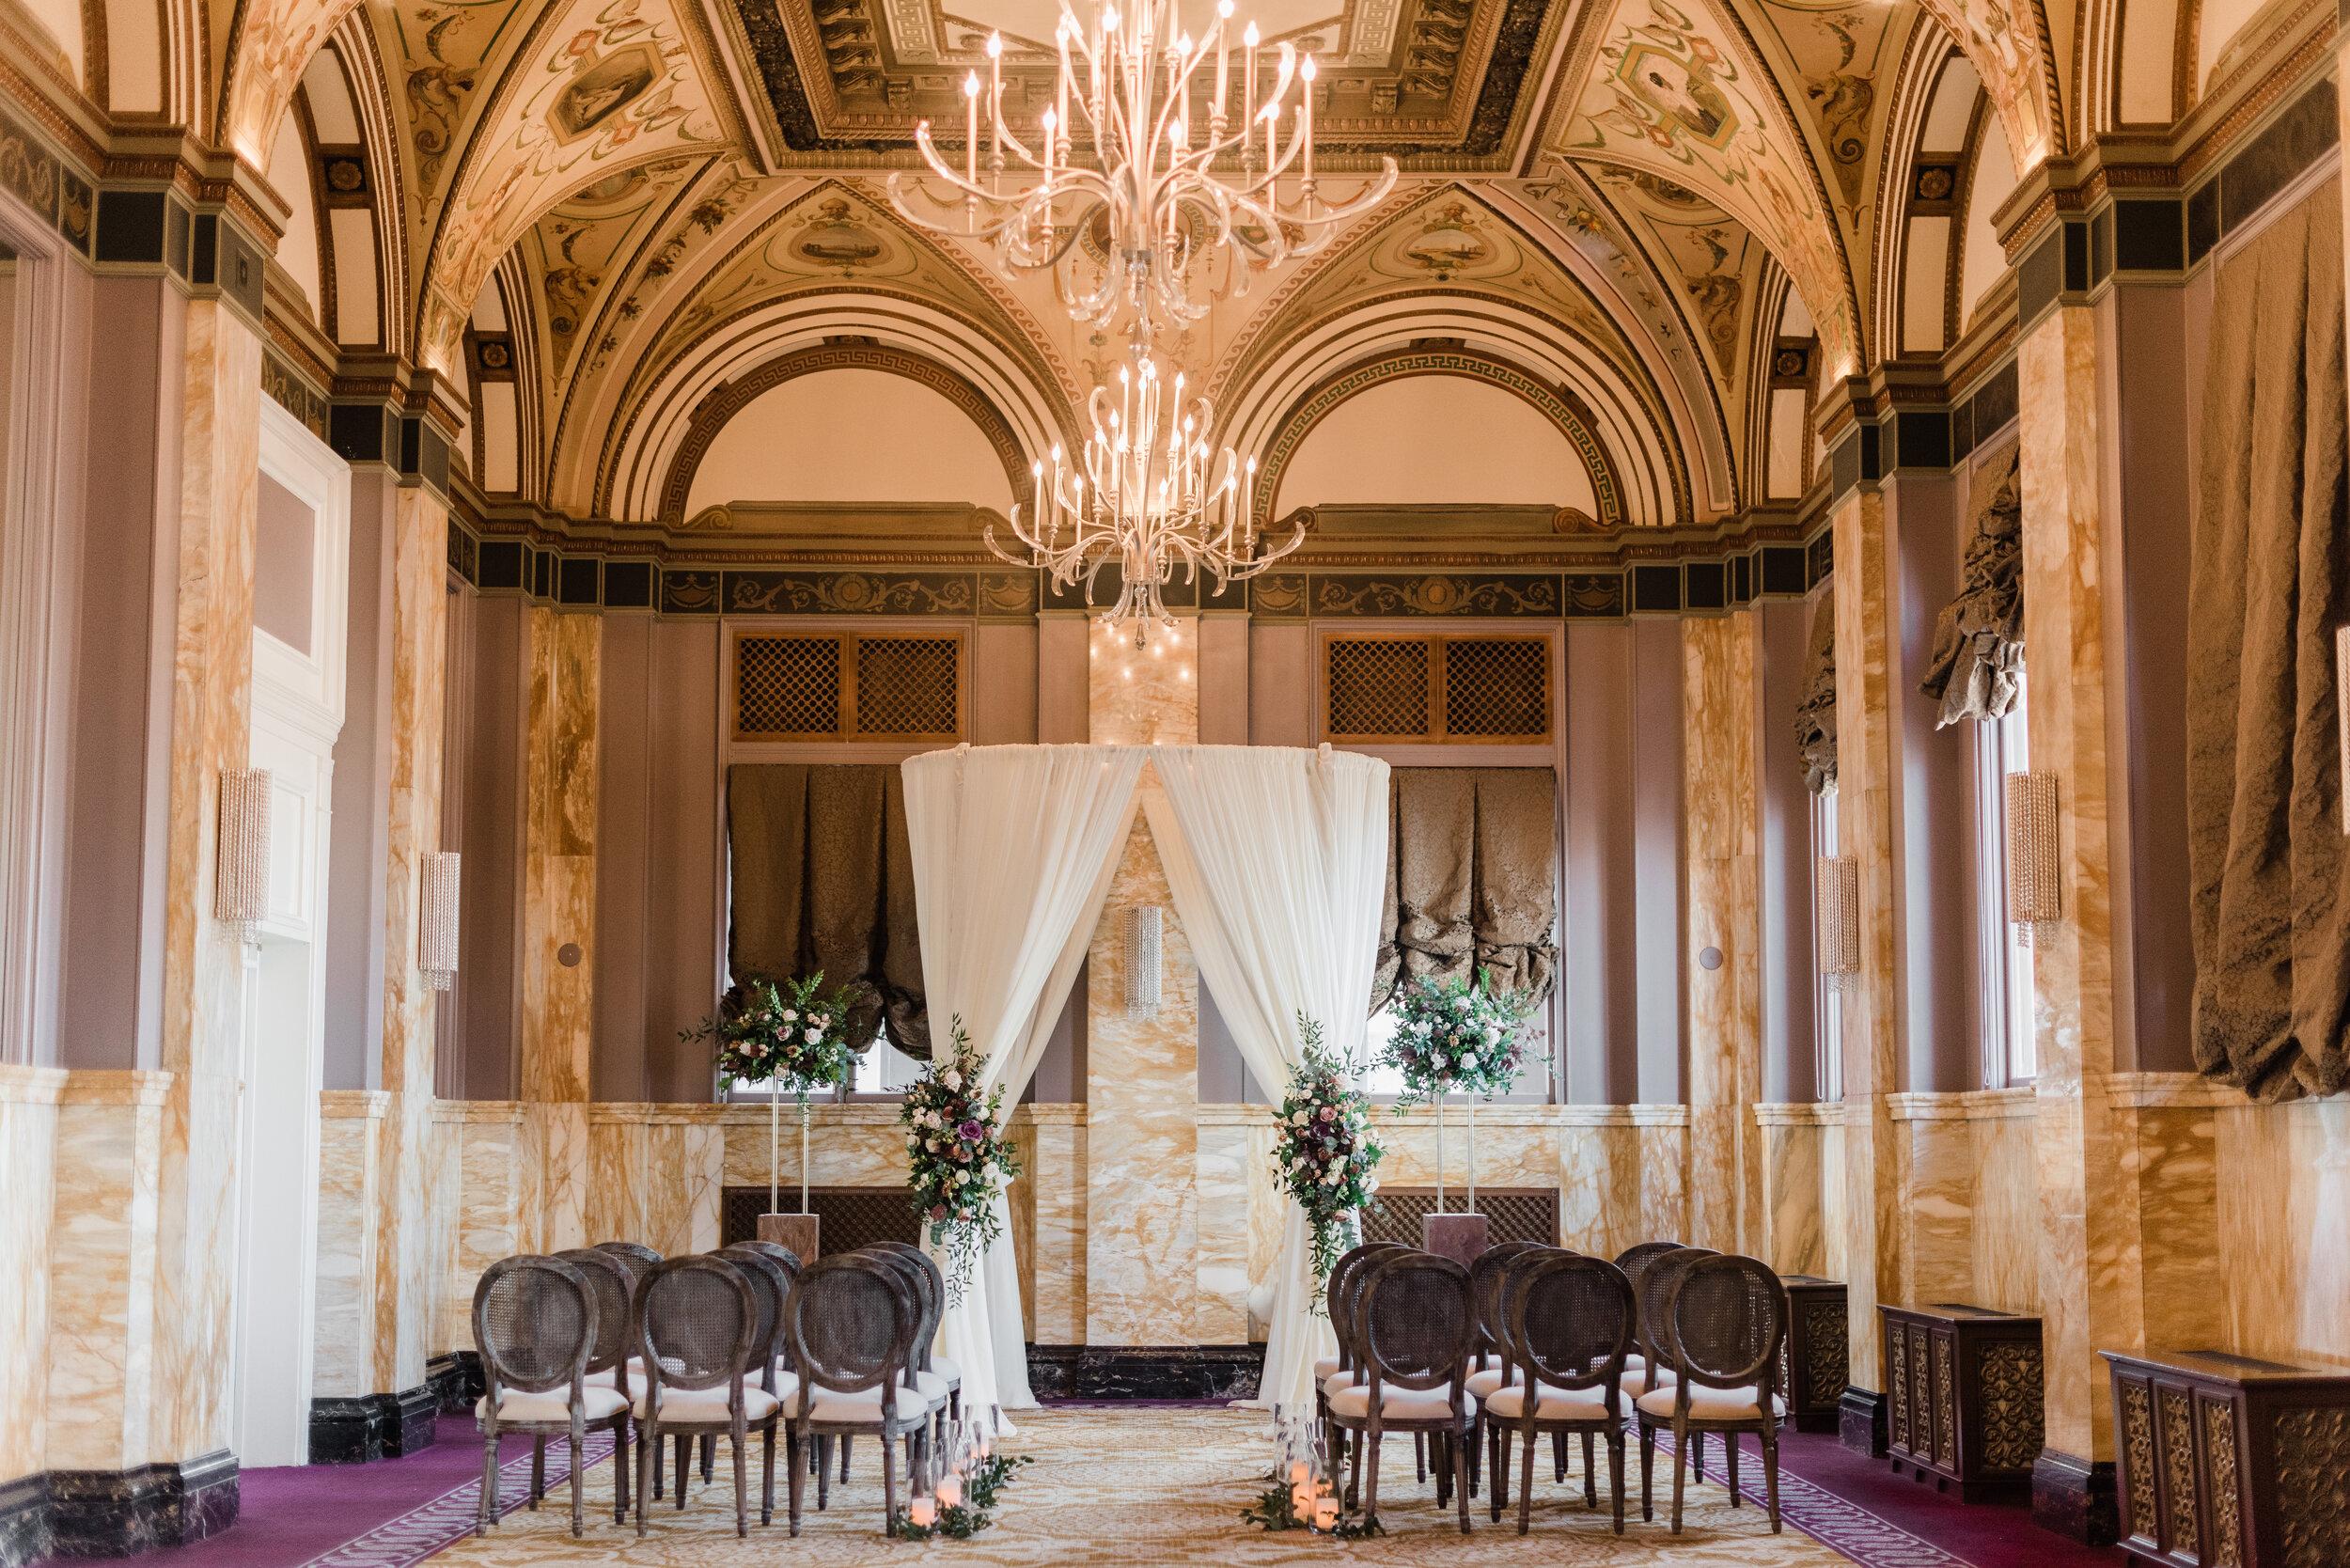 Renaissance Inspired Wedding Photo Shoot